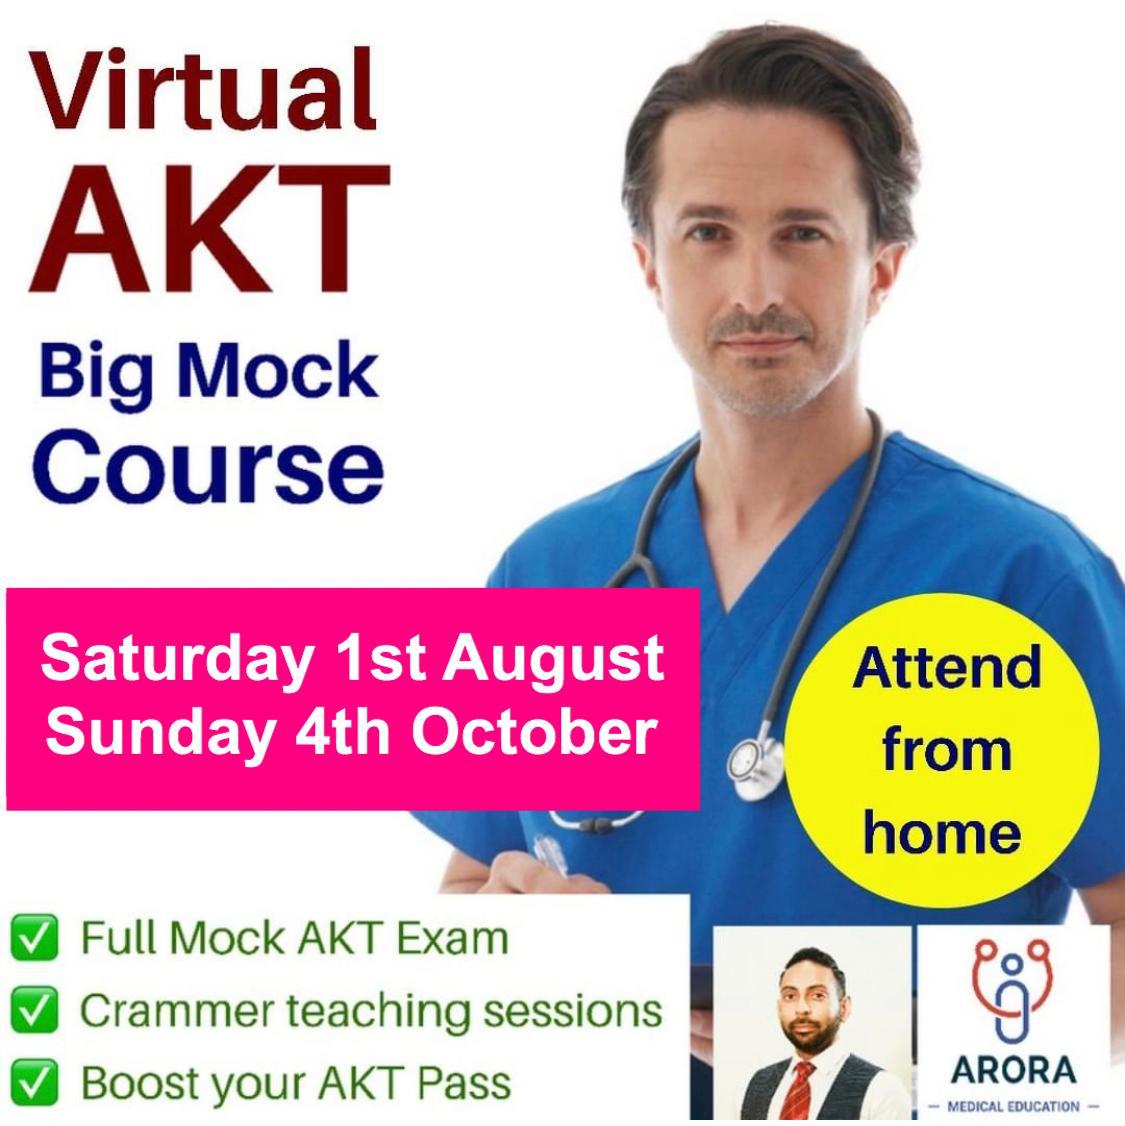 PHOTO 2020 06 25 15 42 10 - MRCGP CSA, AKT and PLAB Exam Courses and Online Webinars - Arora Medical Education